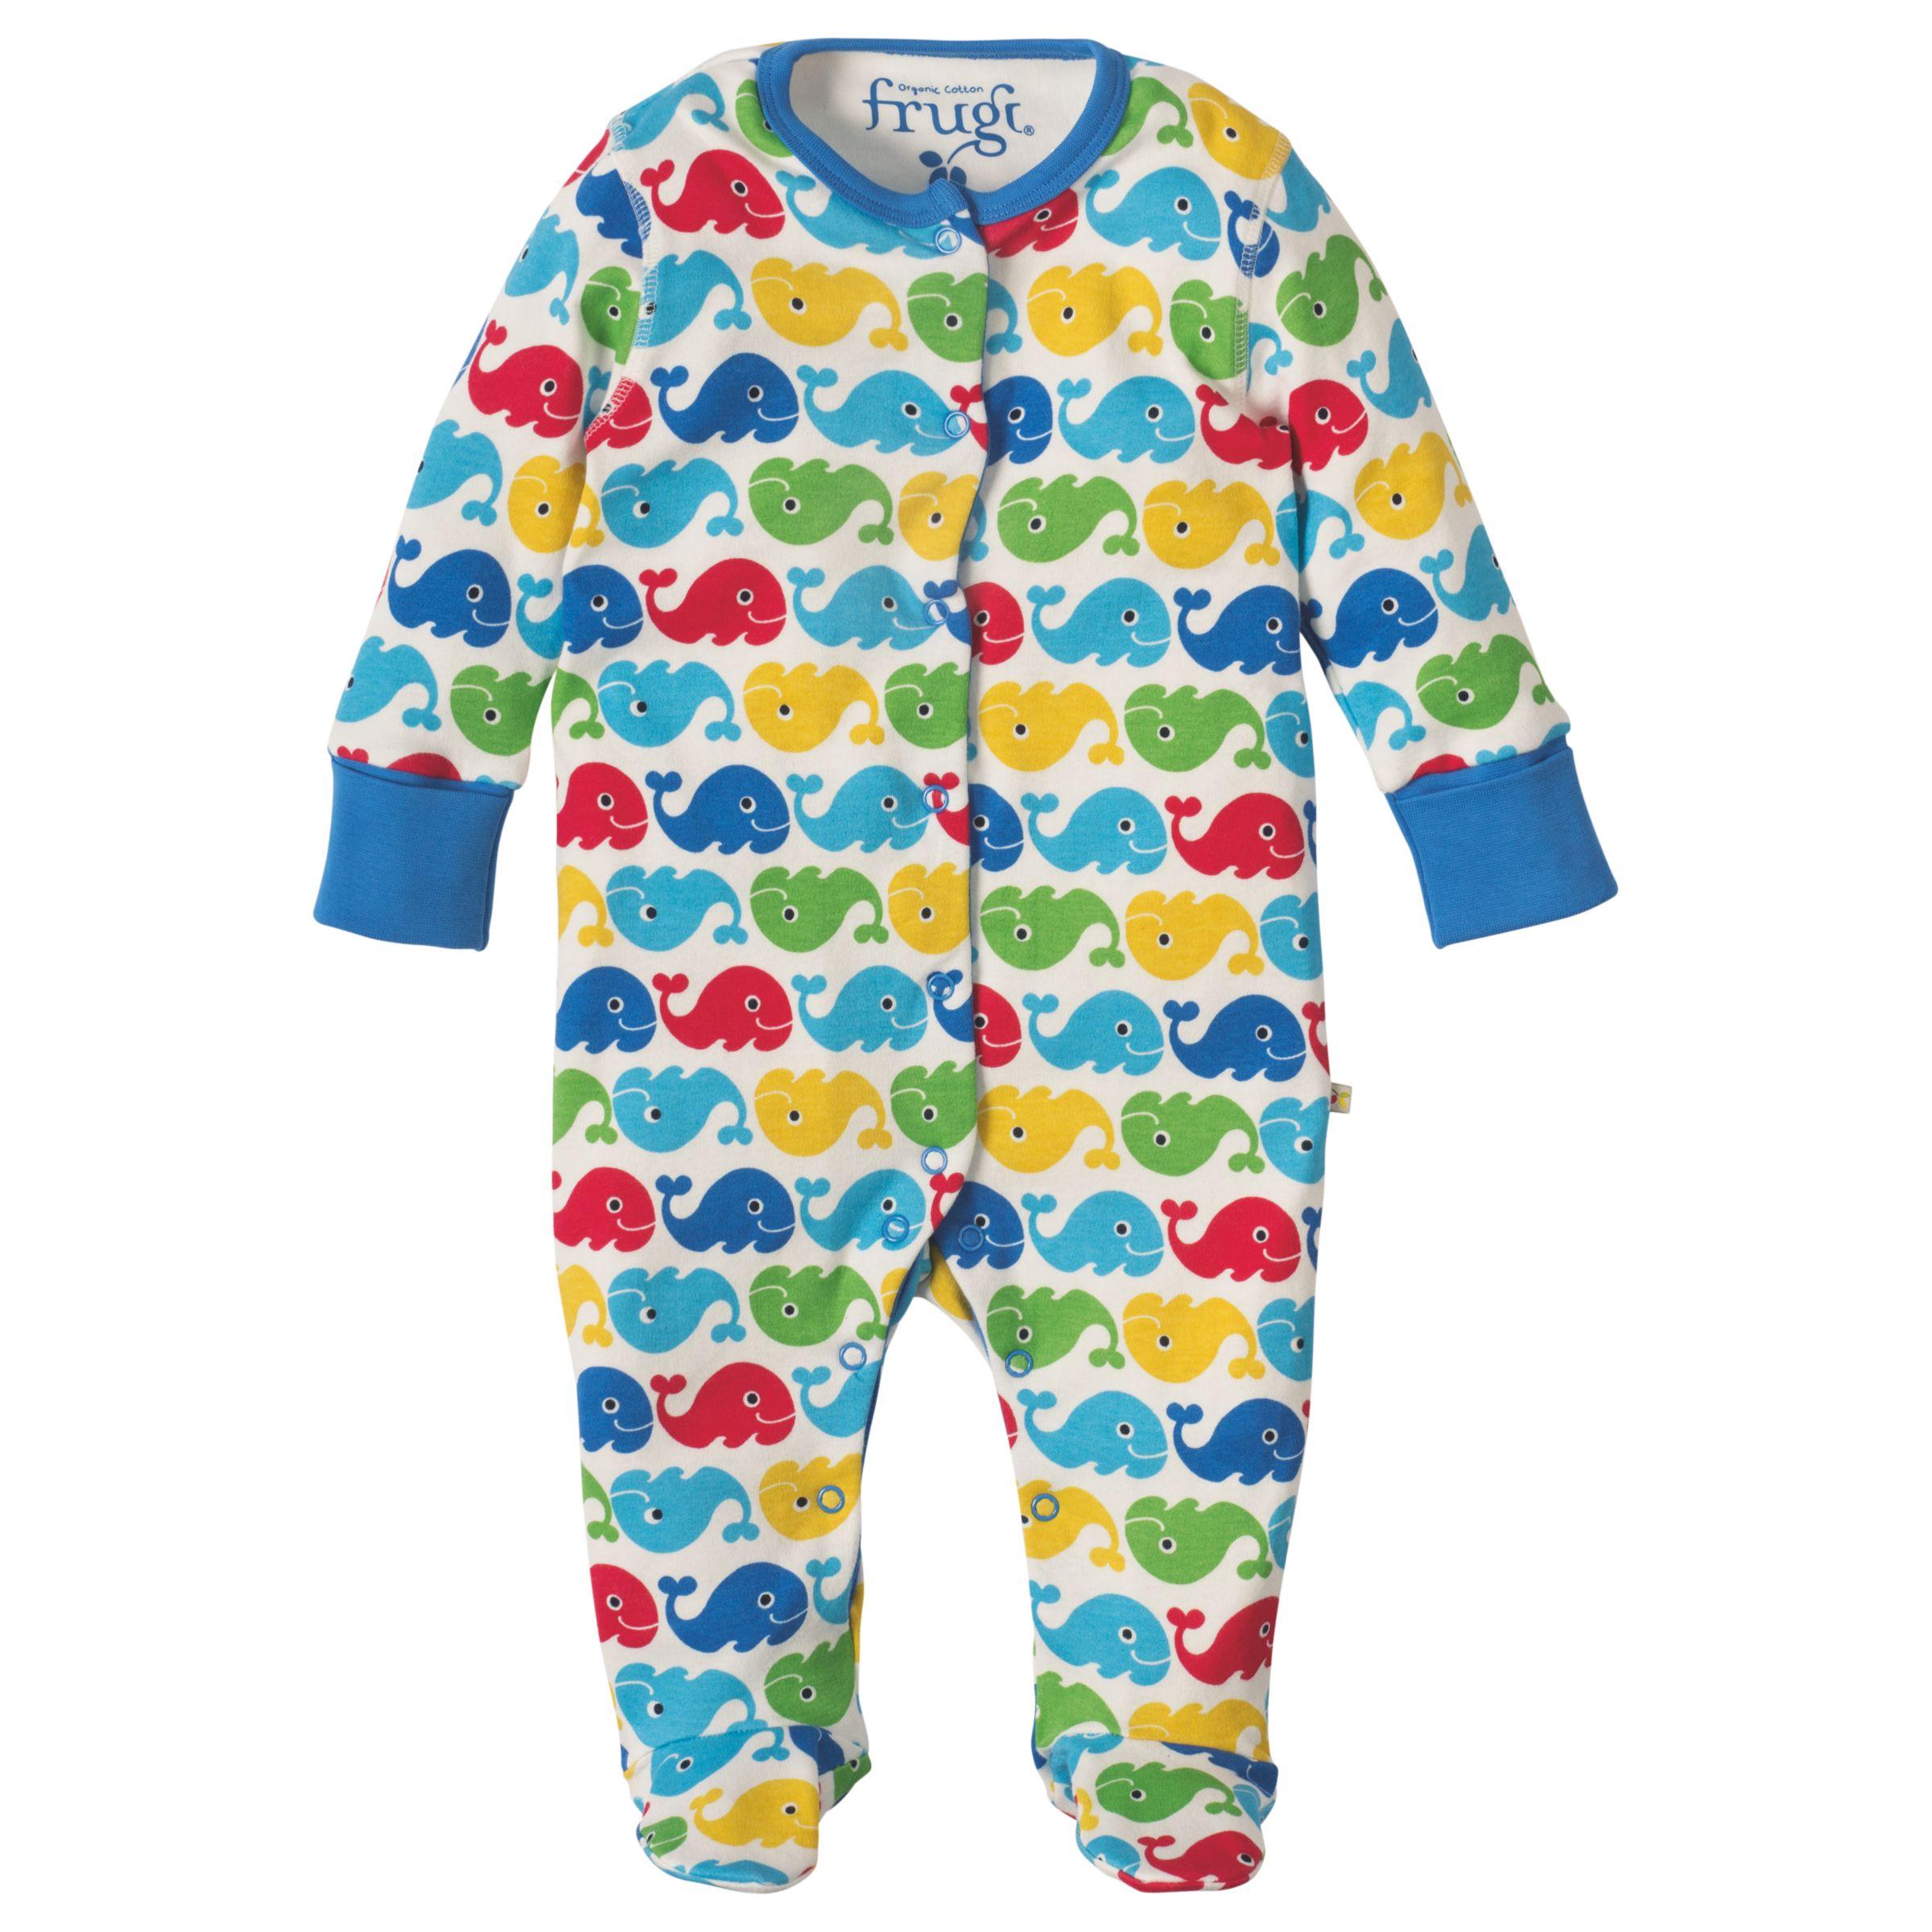 Frugi Organic Frugi Organic Baby Whale Print Sleepsuit, Multi